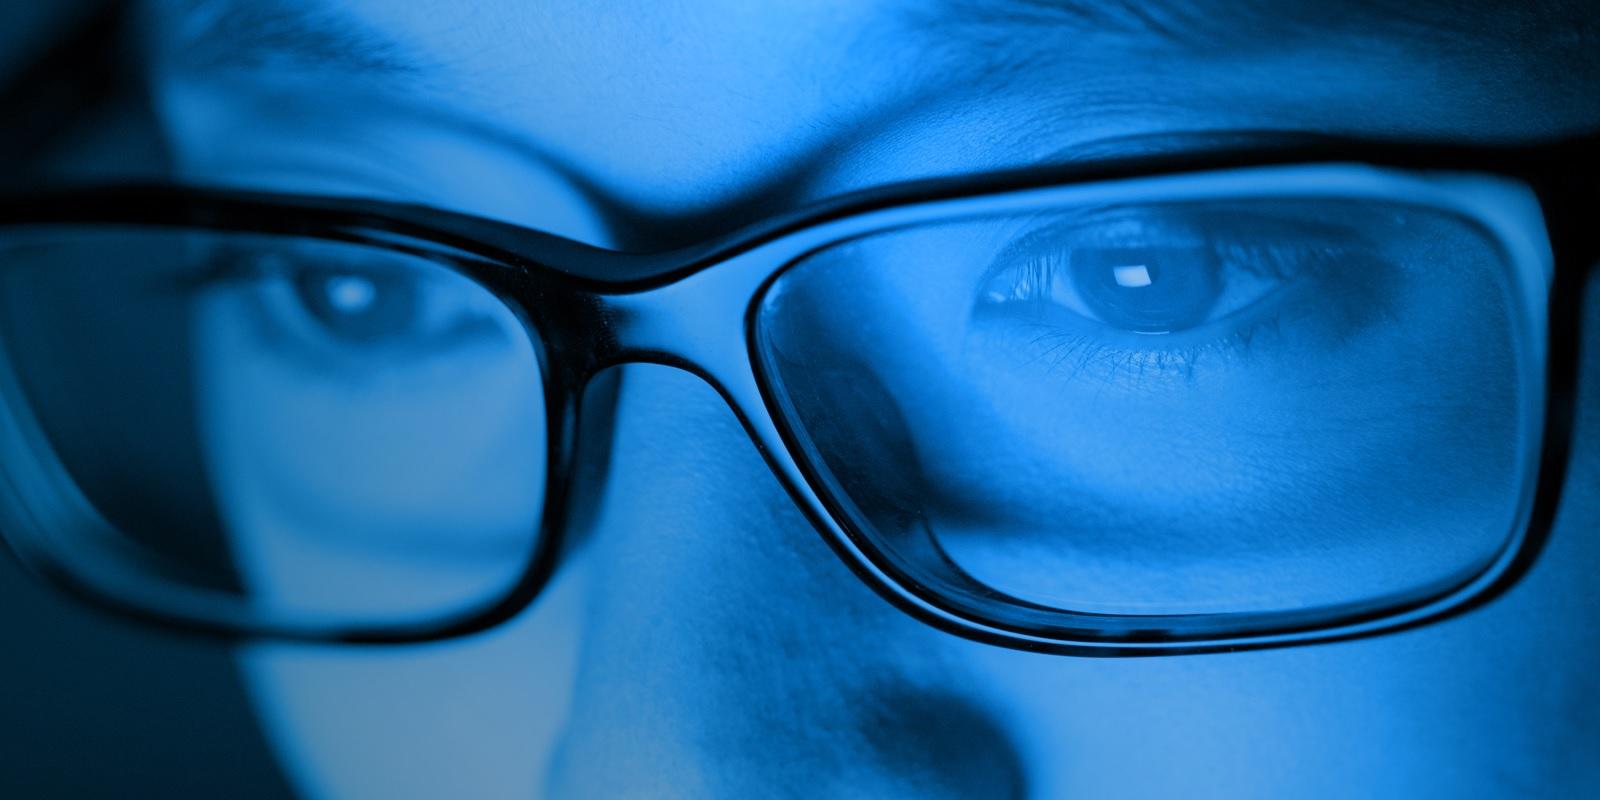 blue light.jpg